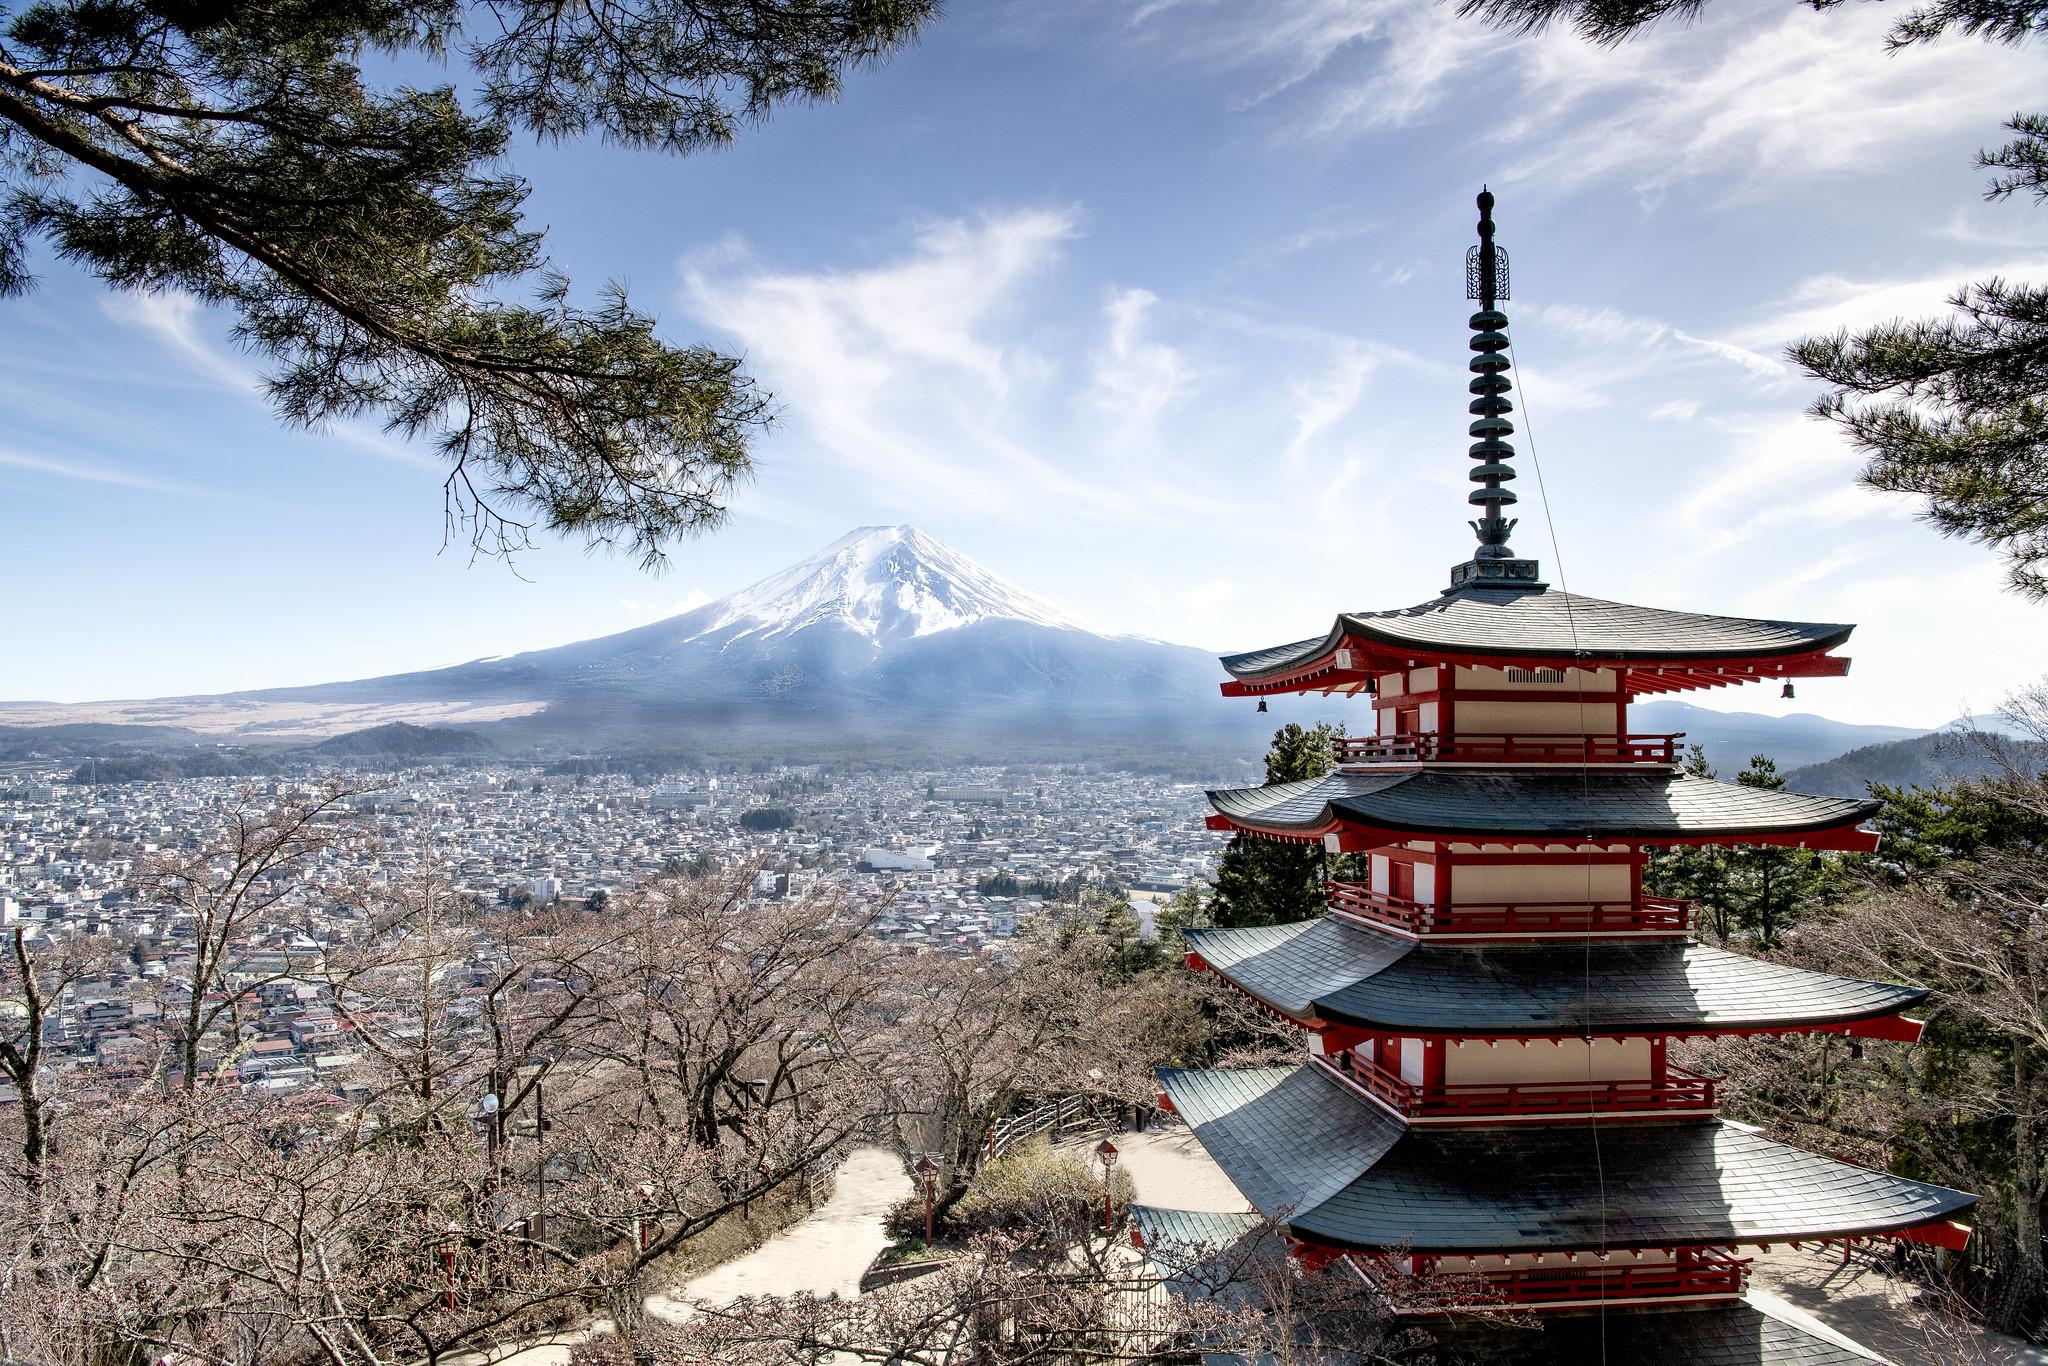 Mt Fuji & Chureito Pagoda